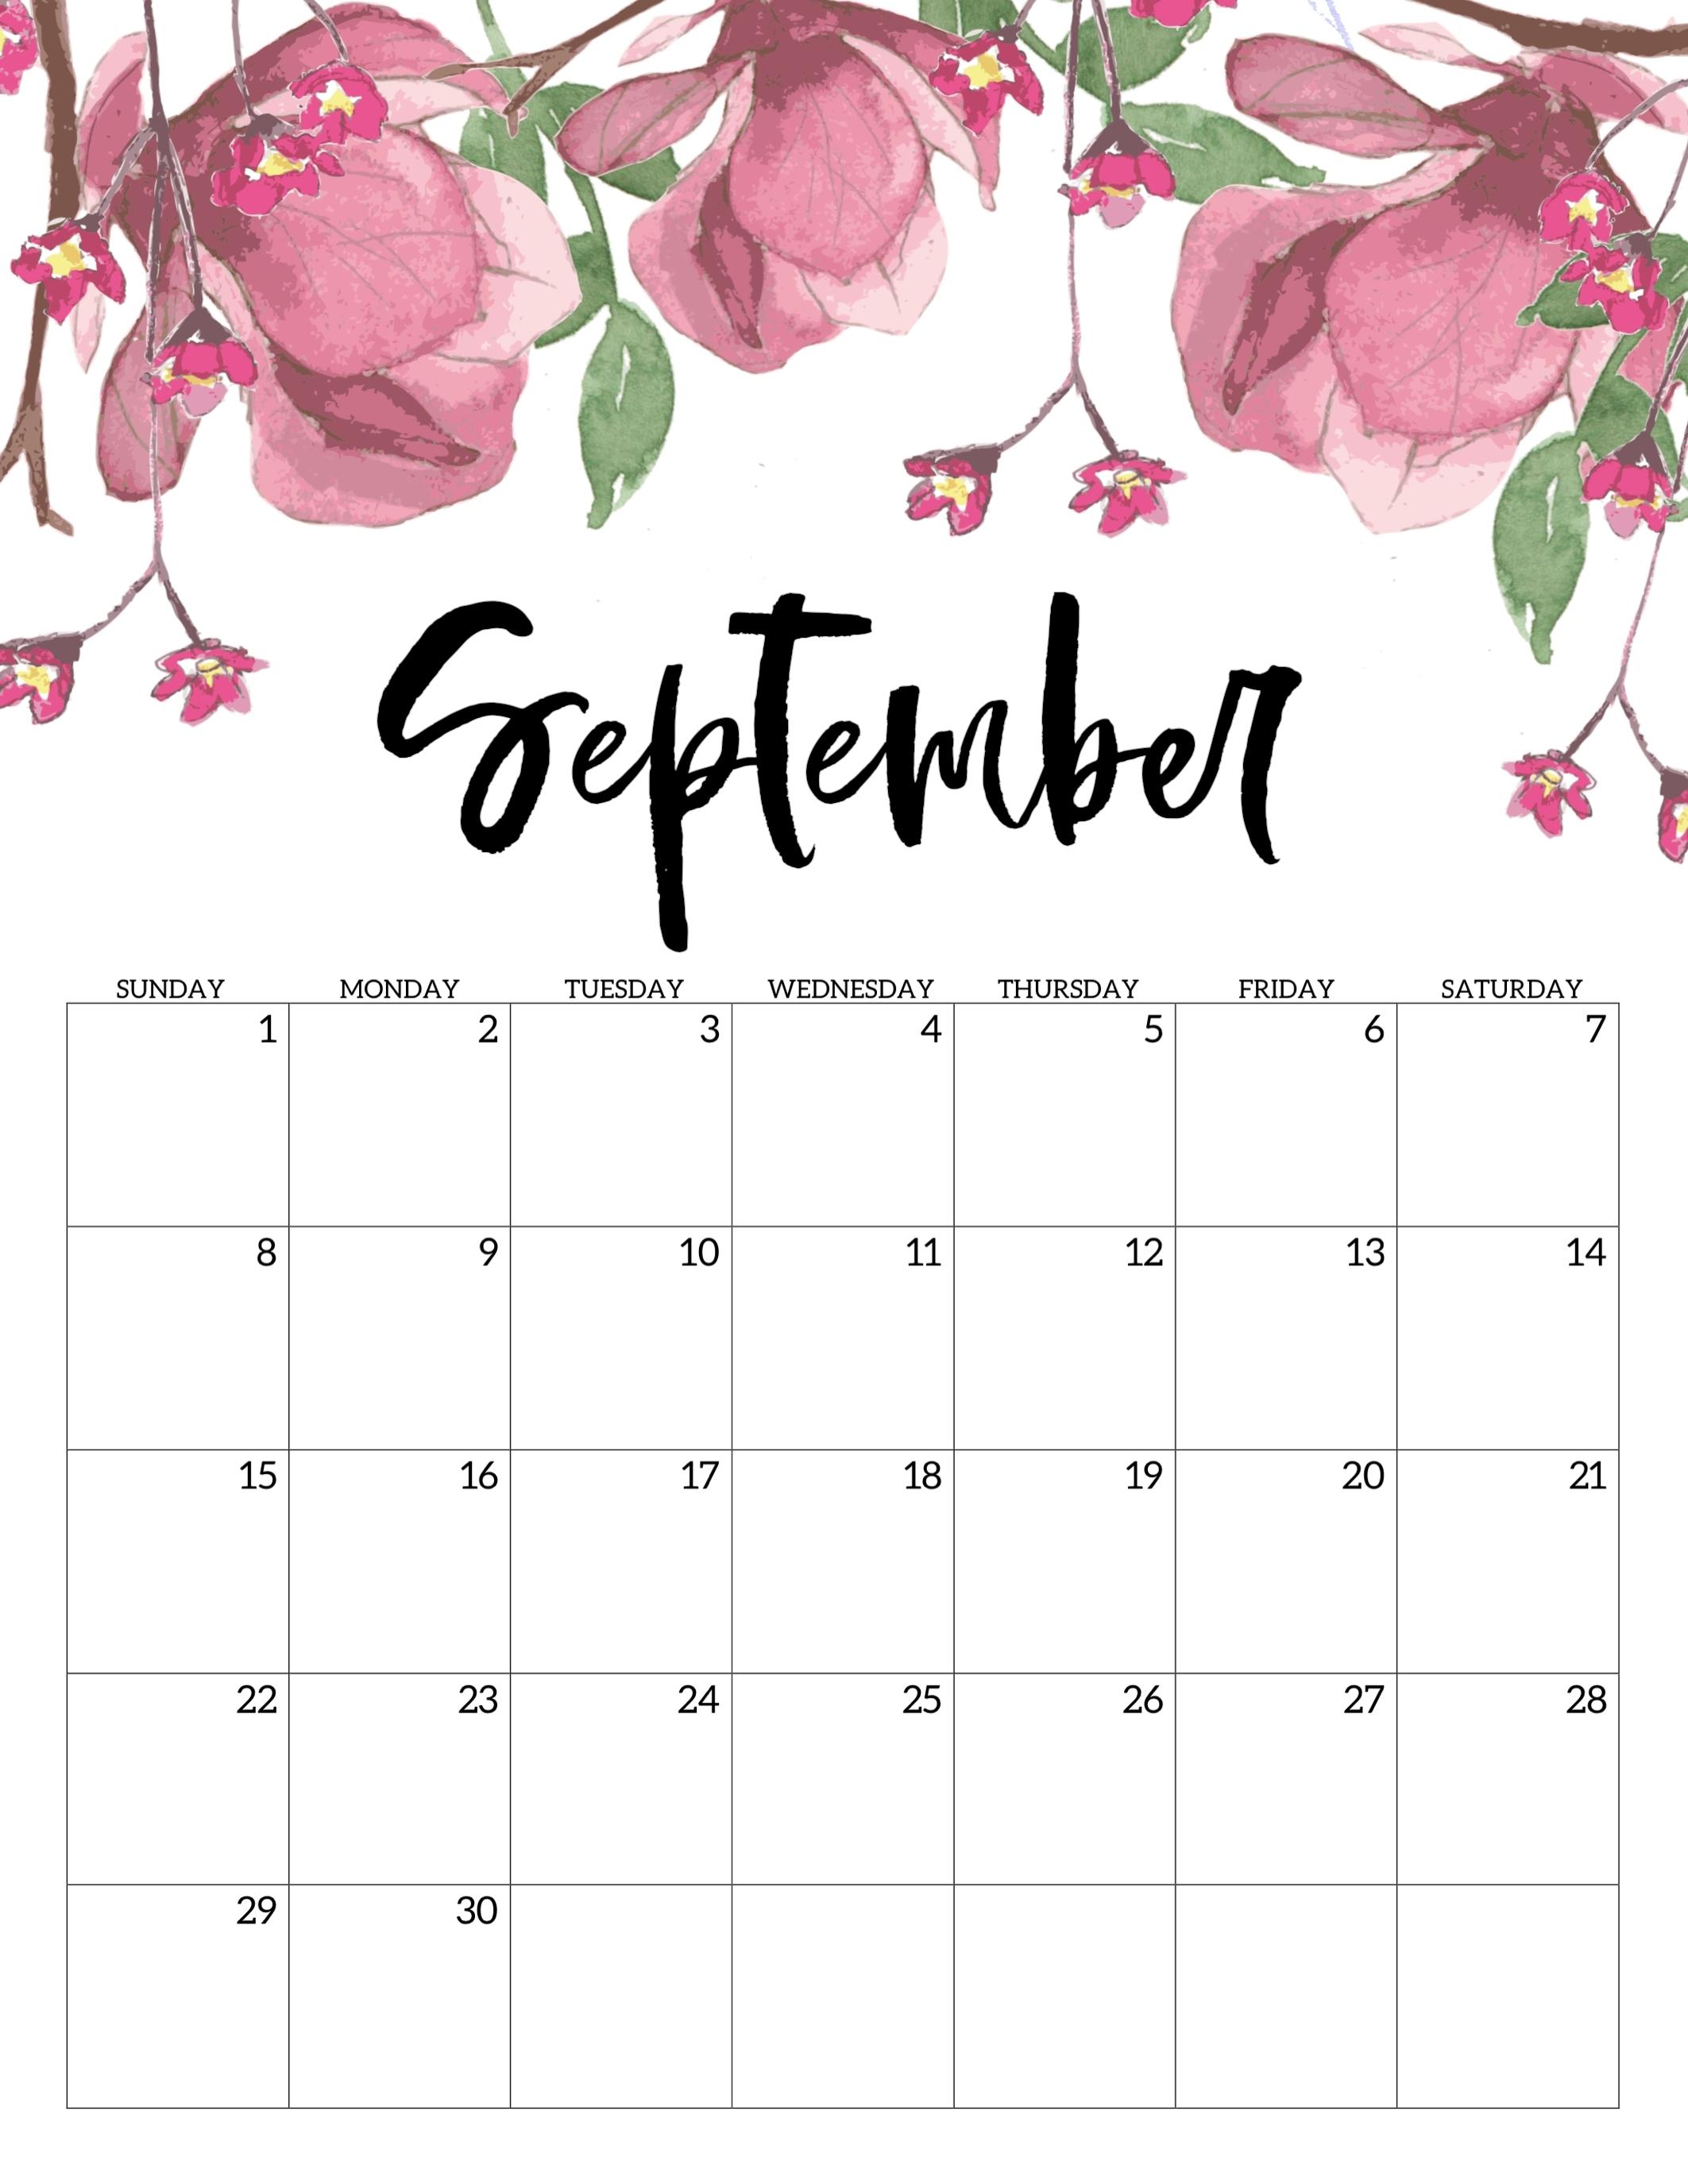 Free Printable Calendar 2019 - Floral - Paper Trail Design